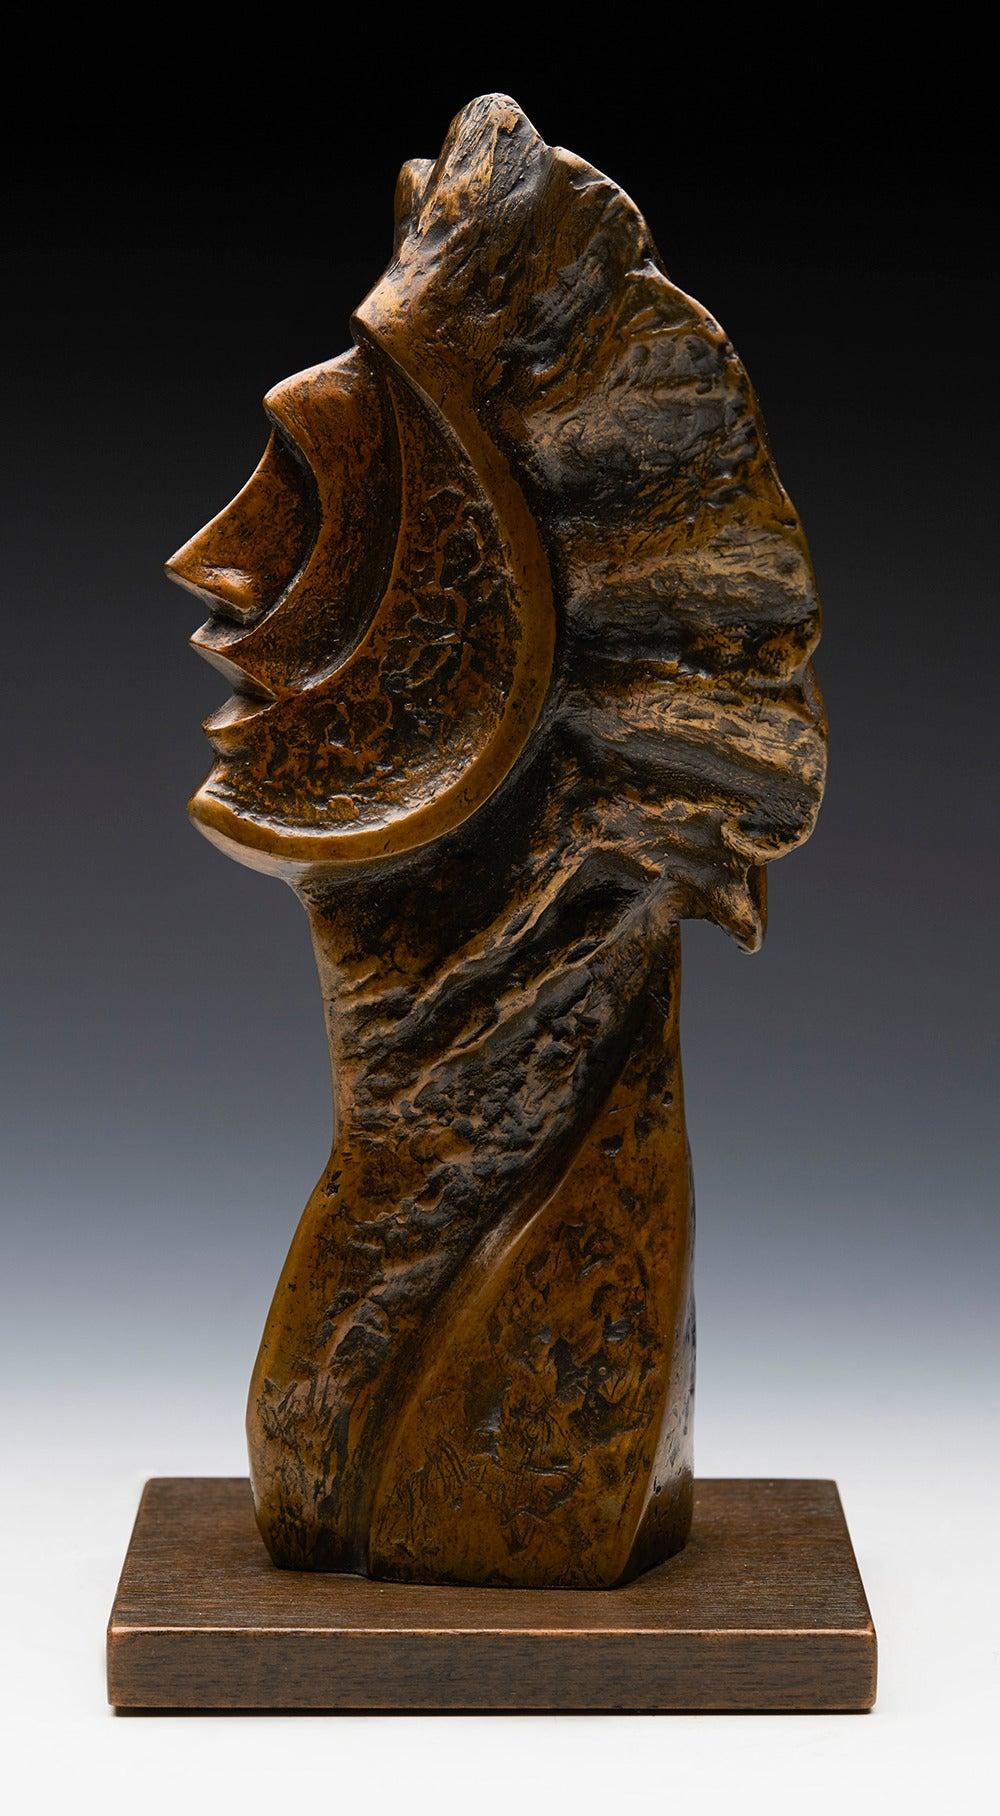 Profile Heads, Limited Edition Bronze Sculpture by John Farnham For Sale 3